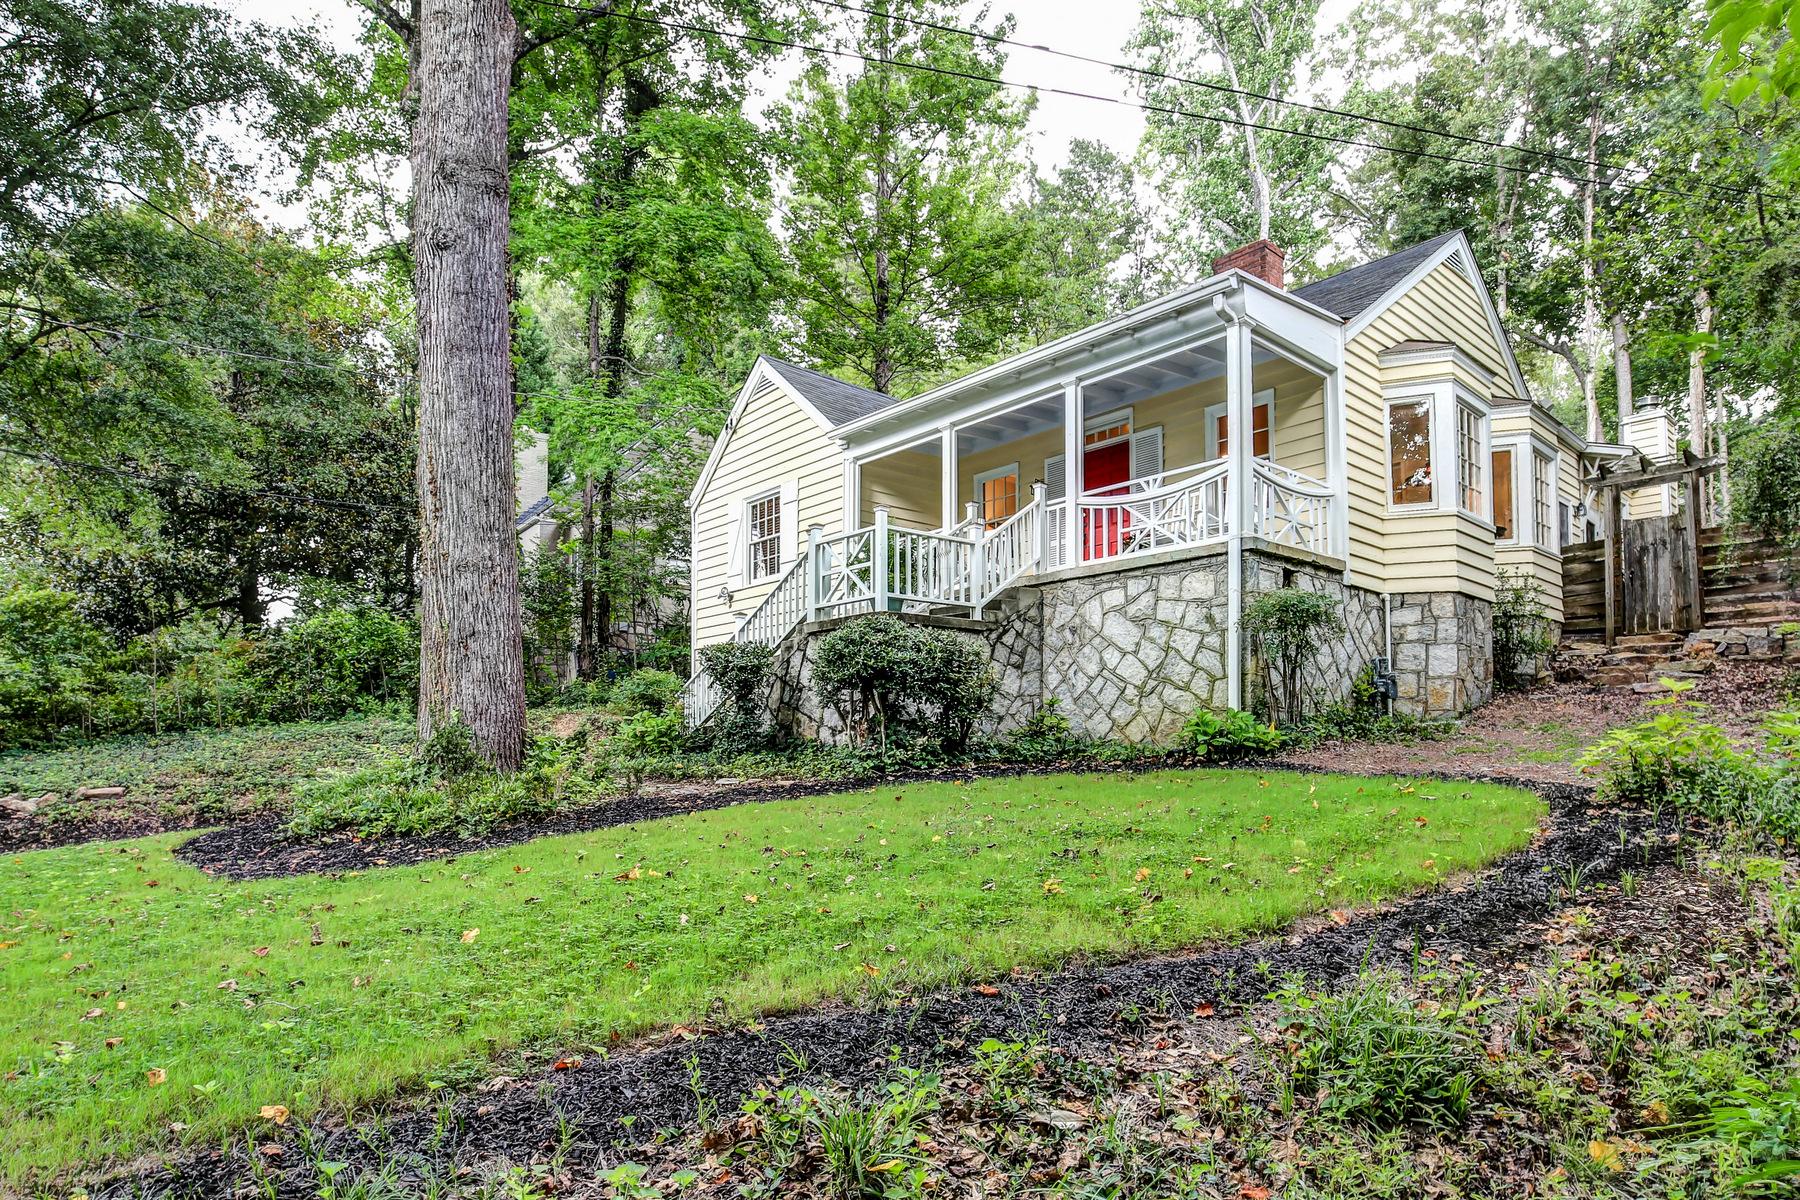 Maison unifamiliale pour l Vente à This May Be The Cutest Home On A Street That Boasts Some Of The Prettiest Houses 323 Glendale Avenue Decatur, Georgia, 30030 États-Unis